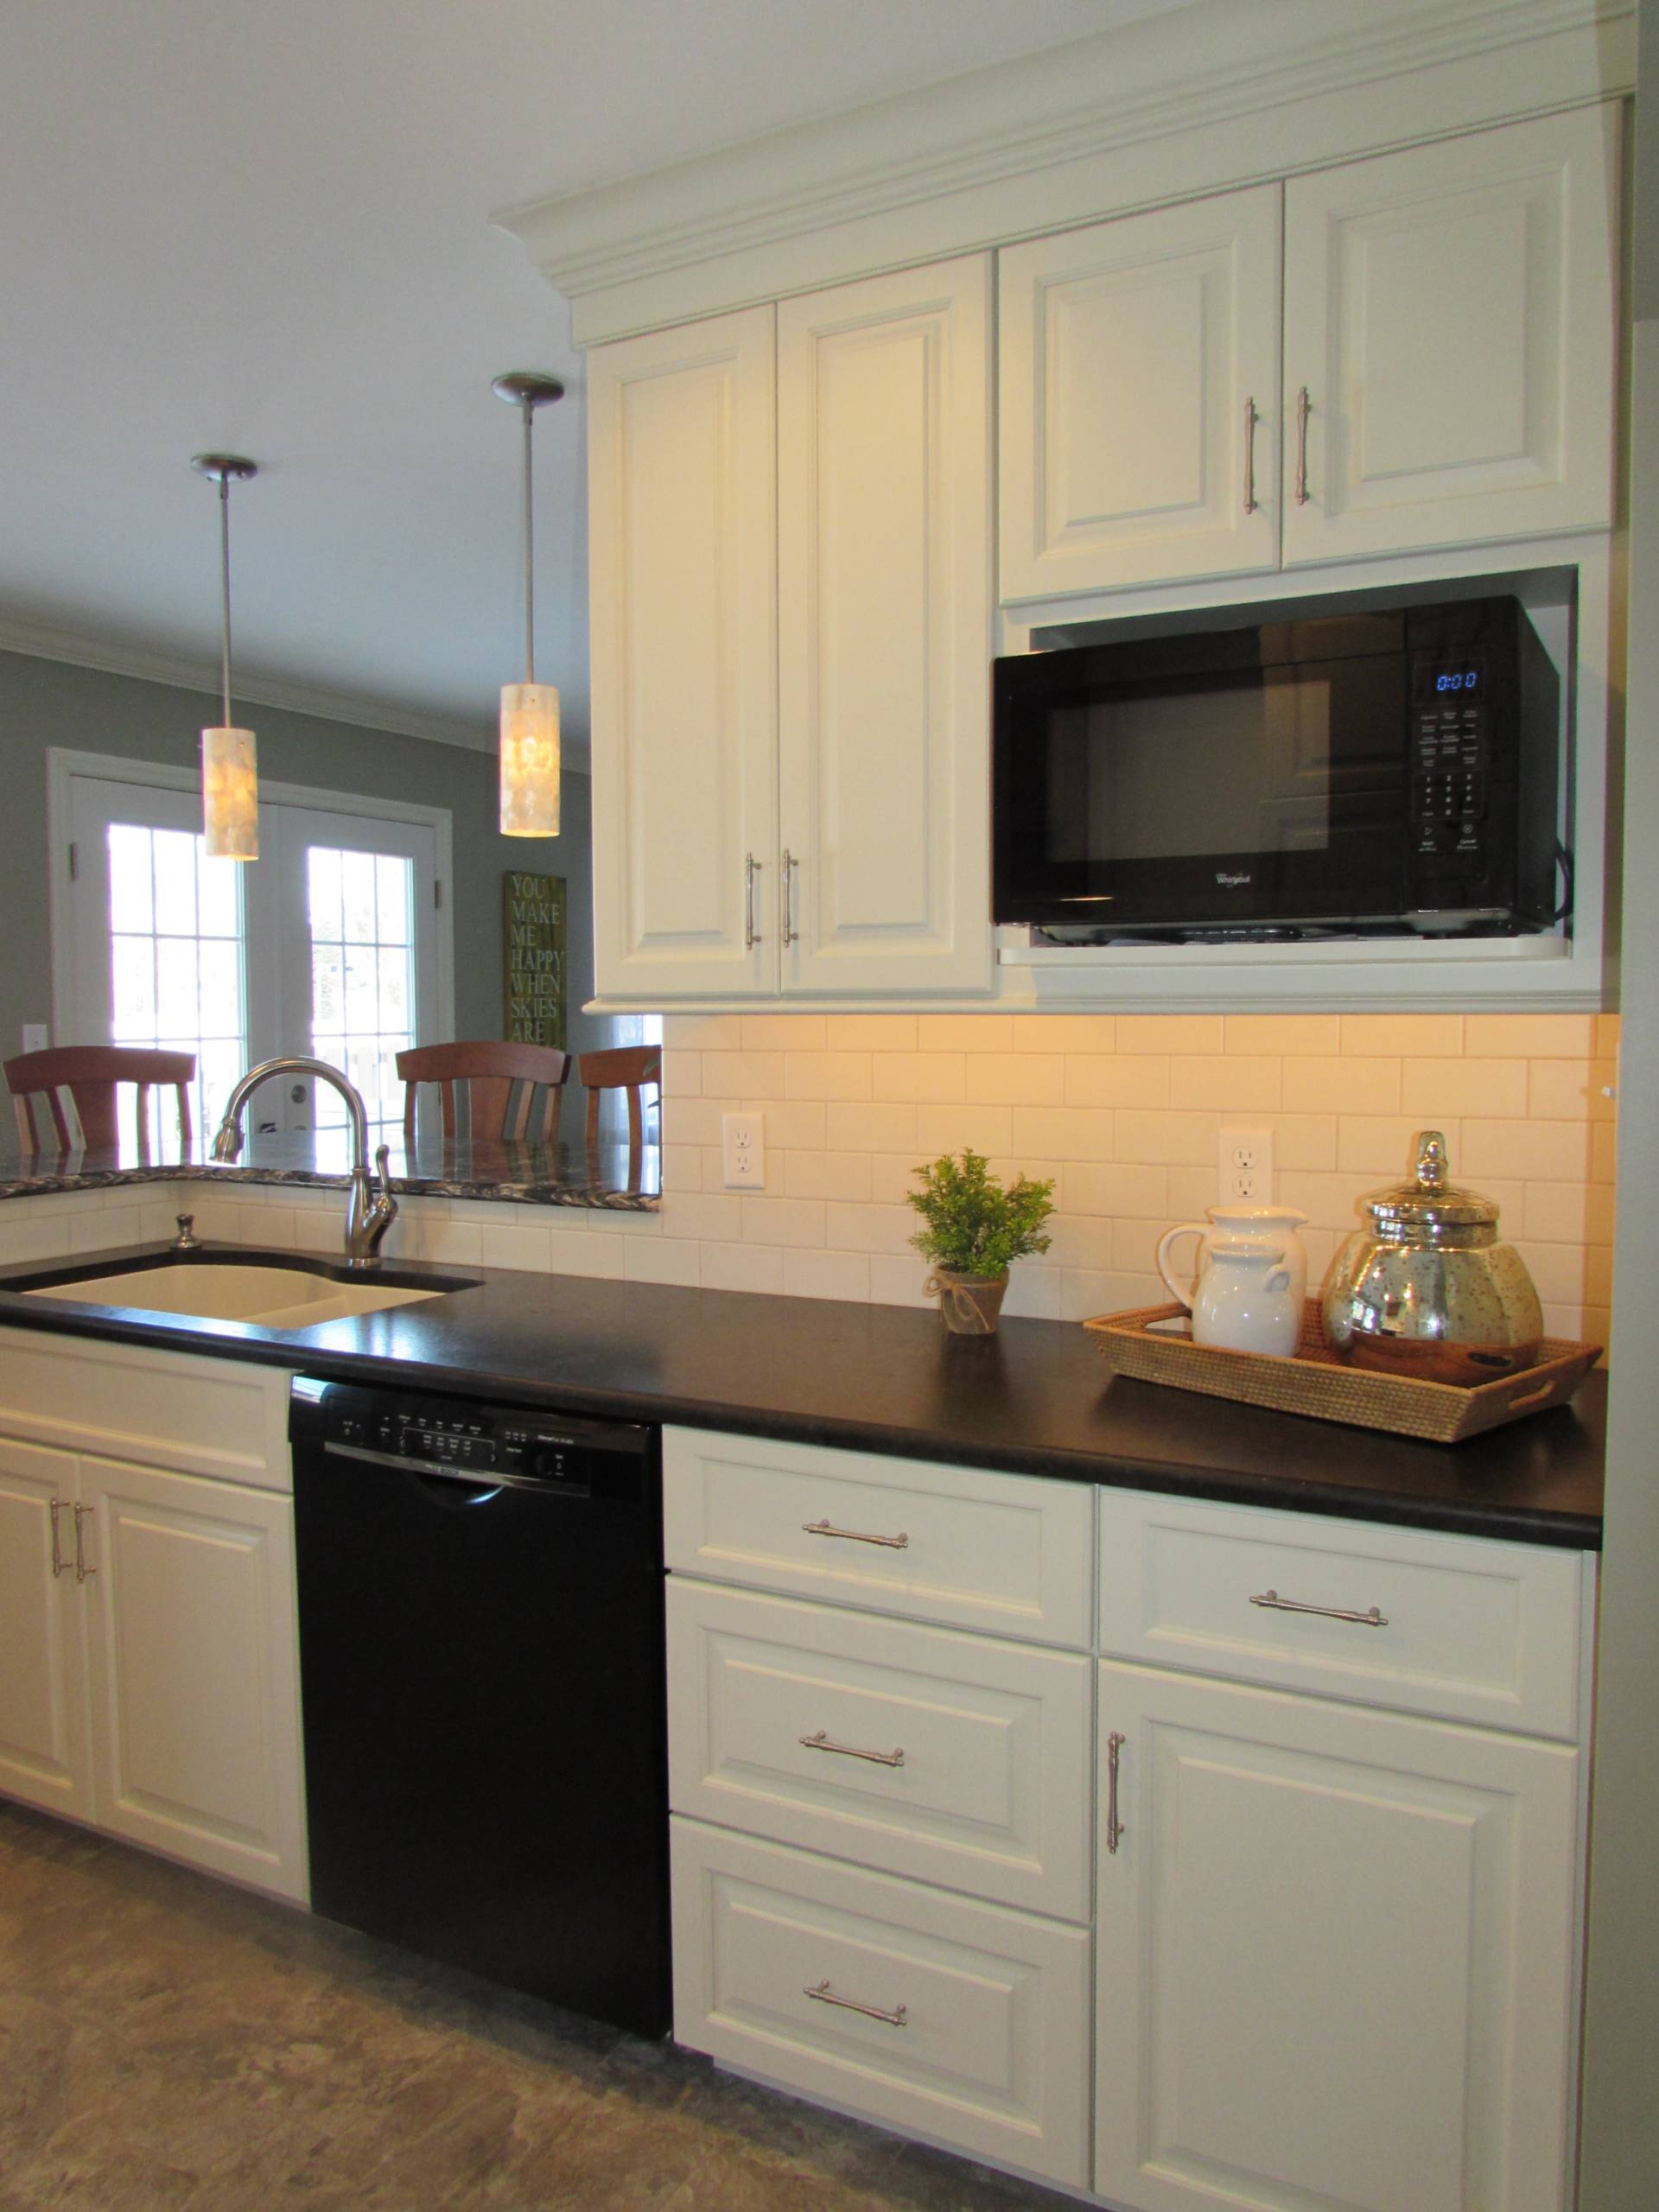 kitchen and bathroom remodeling kitchen remodeling york pa Narvon Kitchen